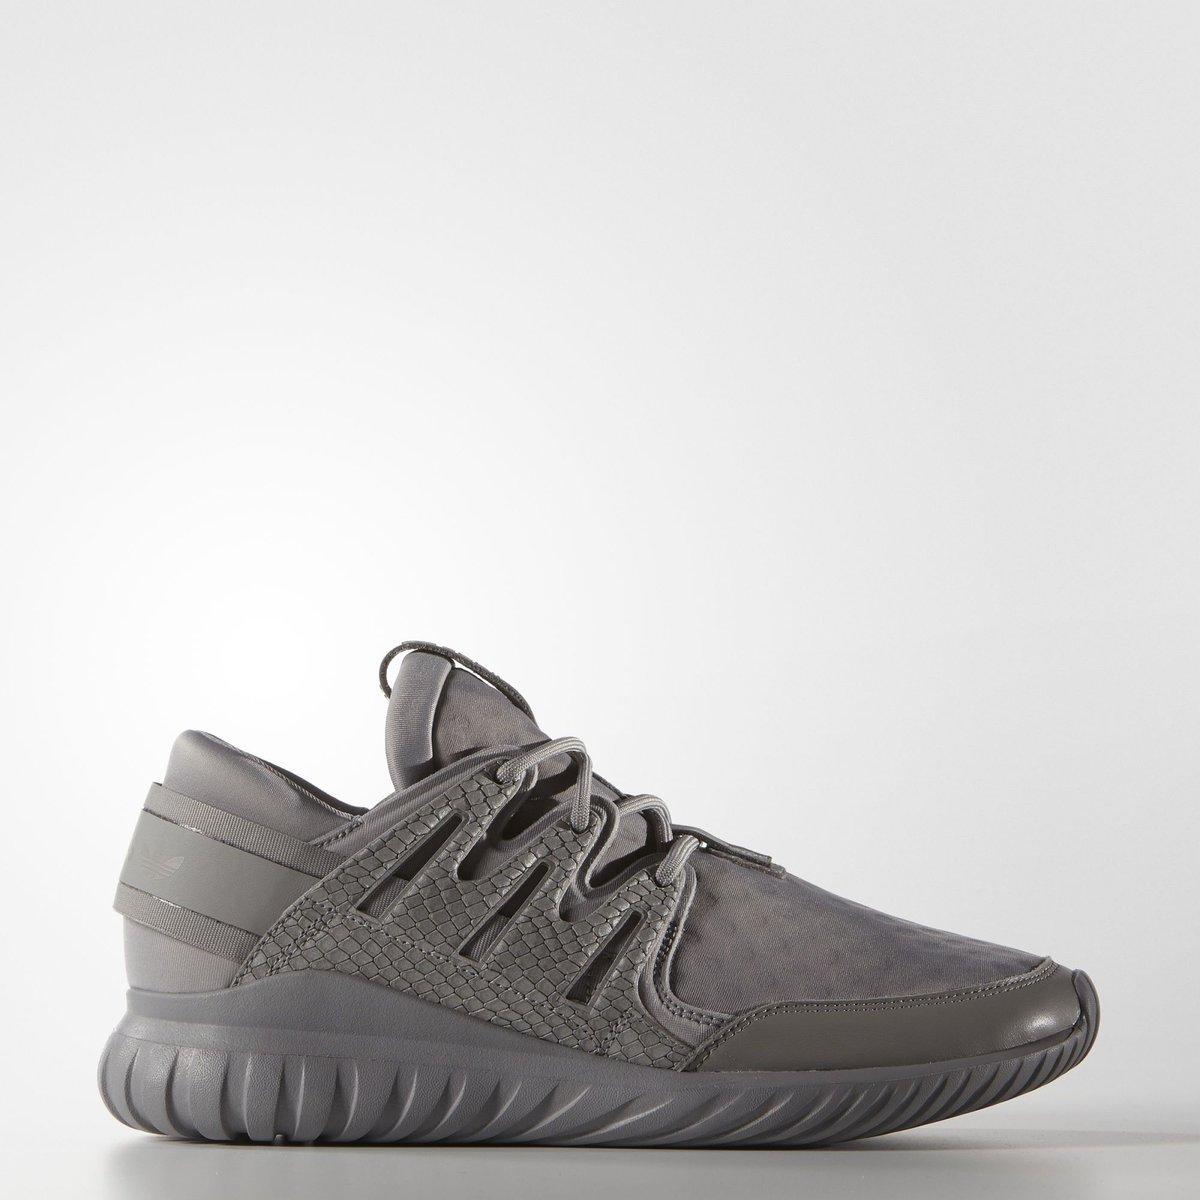 259af3fec161 Adidas Tubular Nova Textile Solid Grey Metallic Silver Releasing Thursday